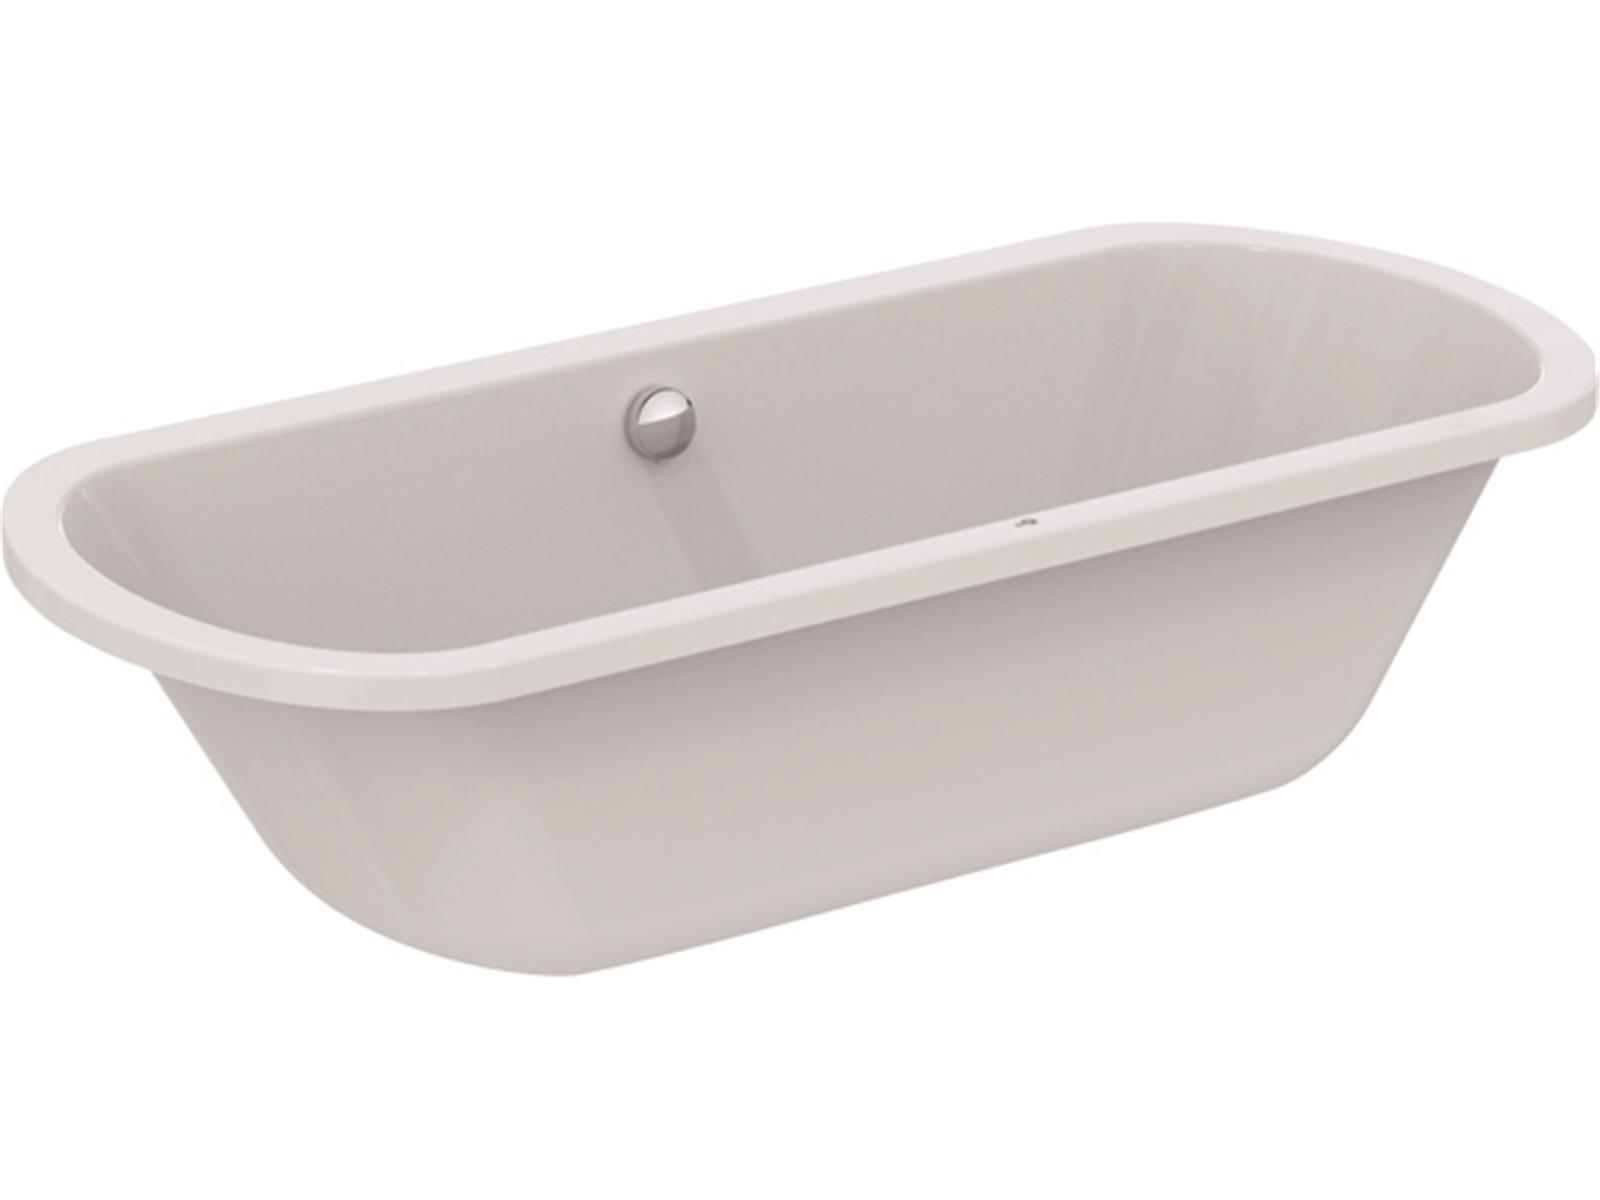 IS Oval-Badewanne Hotline Neu 1800x800x465mm Weiß